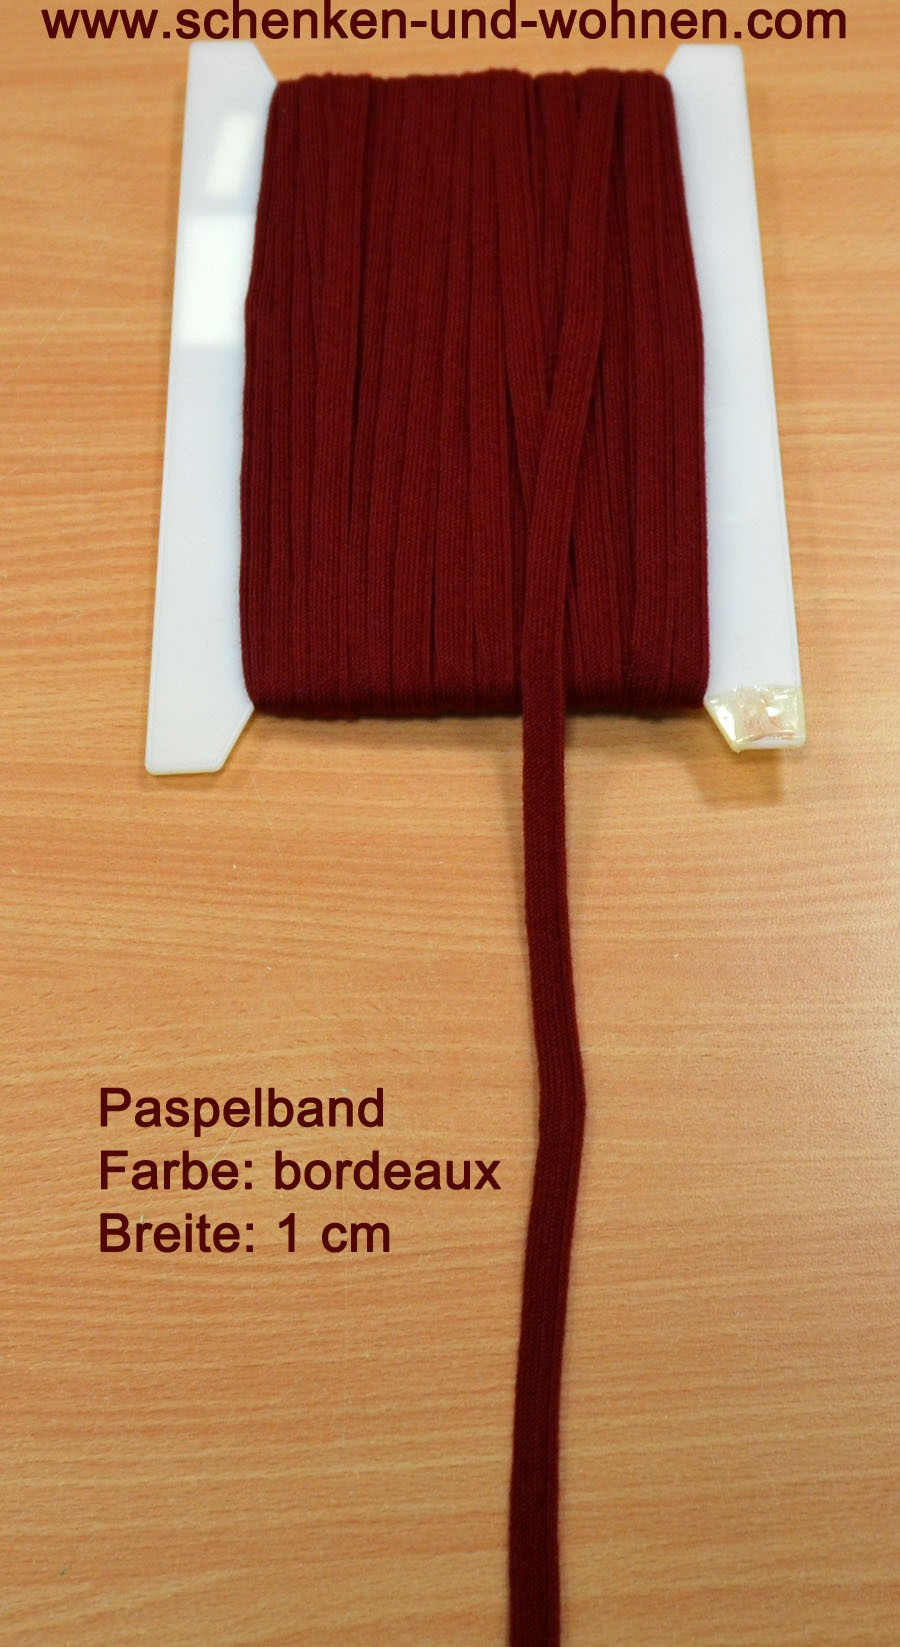 Paspel Keder Borte 1 cm breit bordeaux Meterware